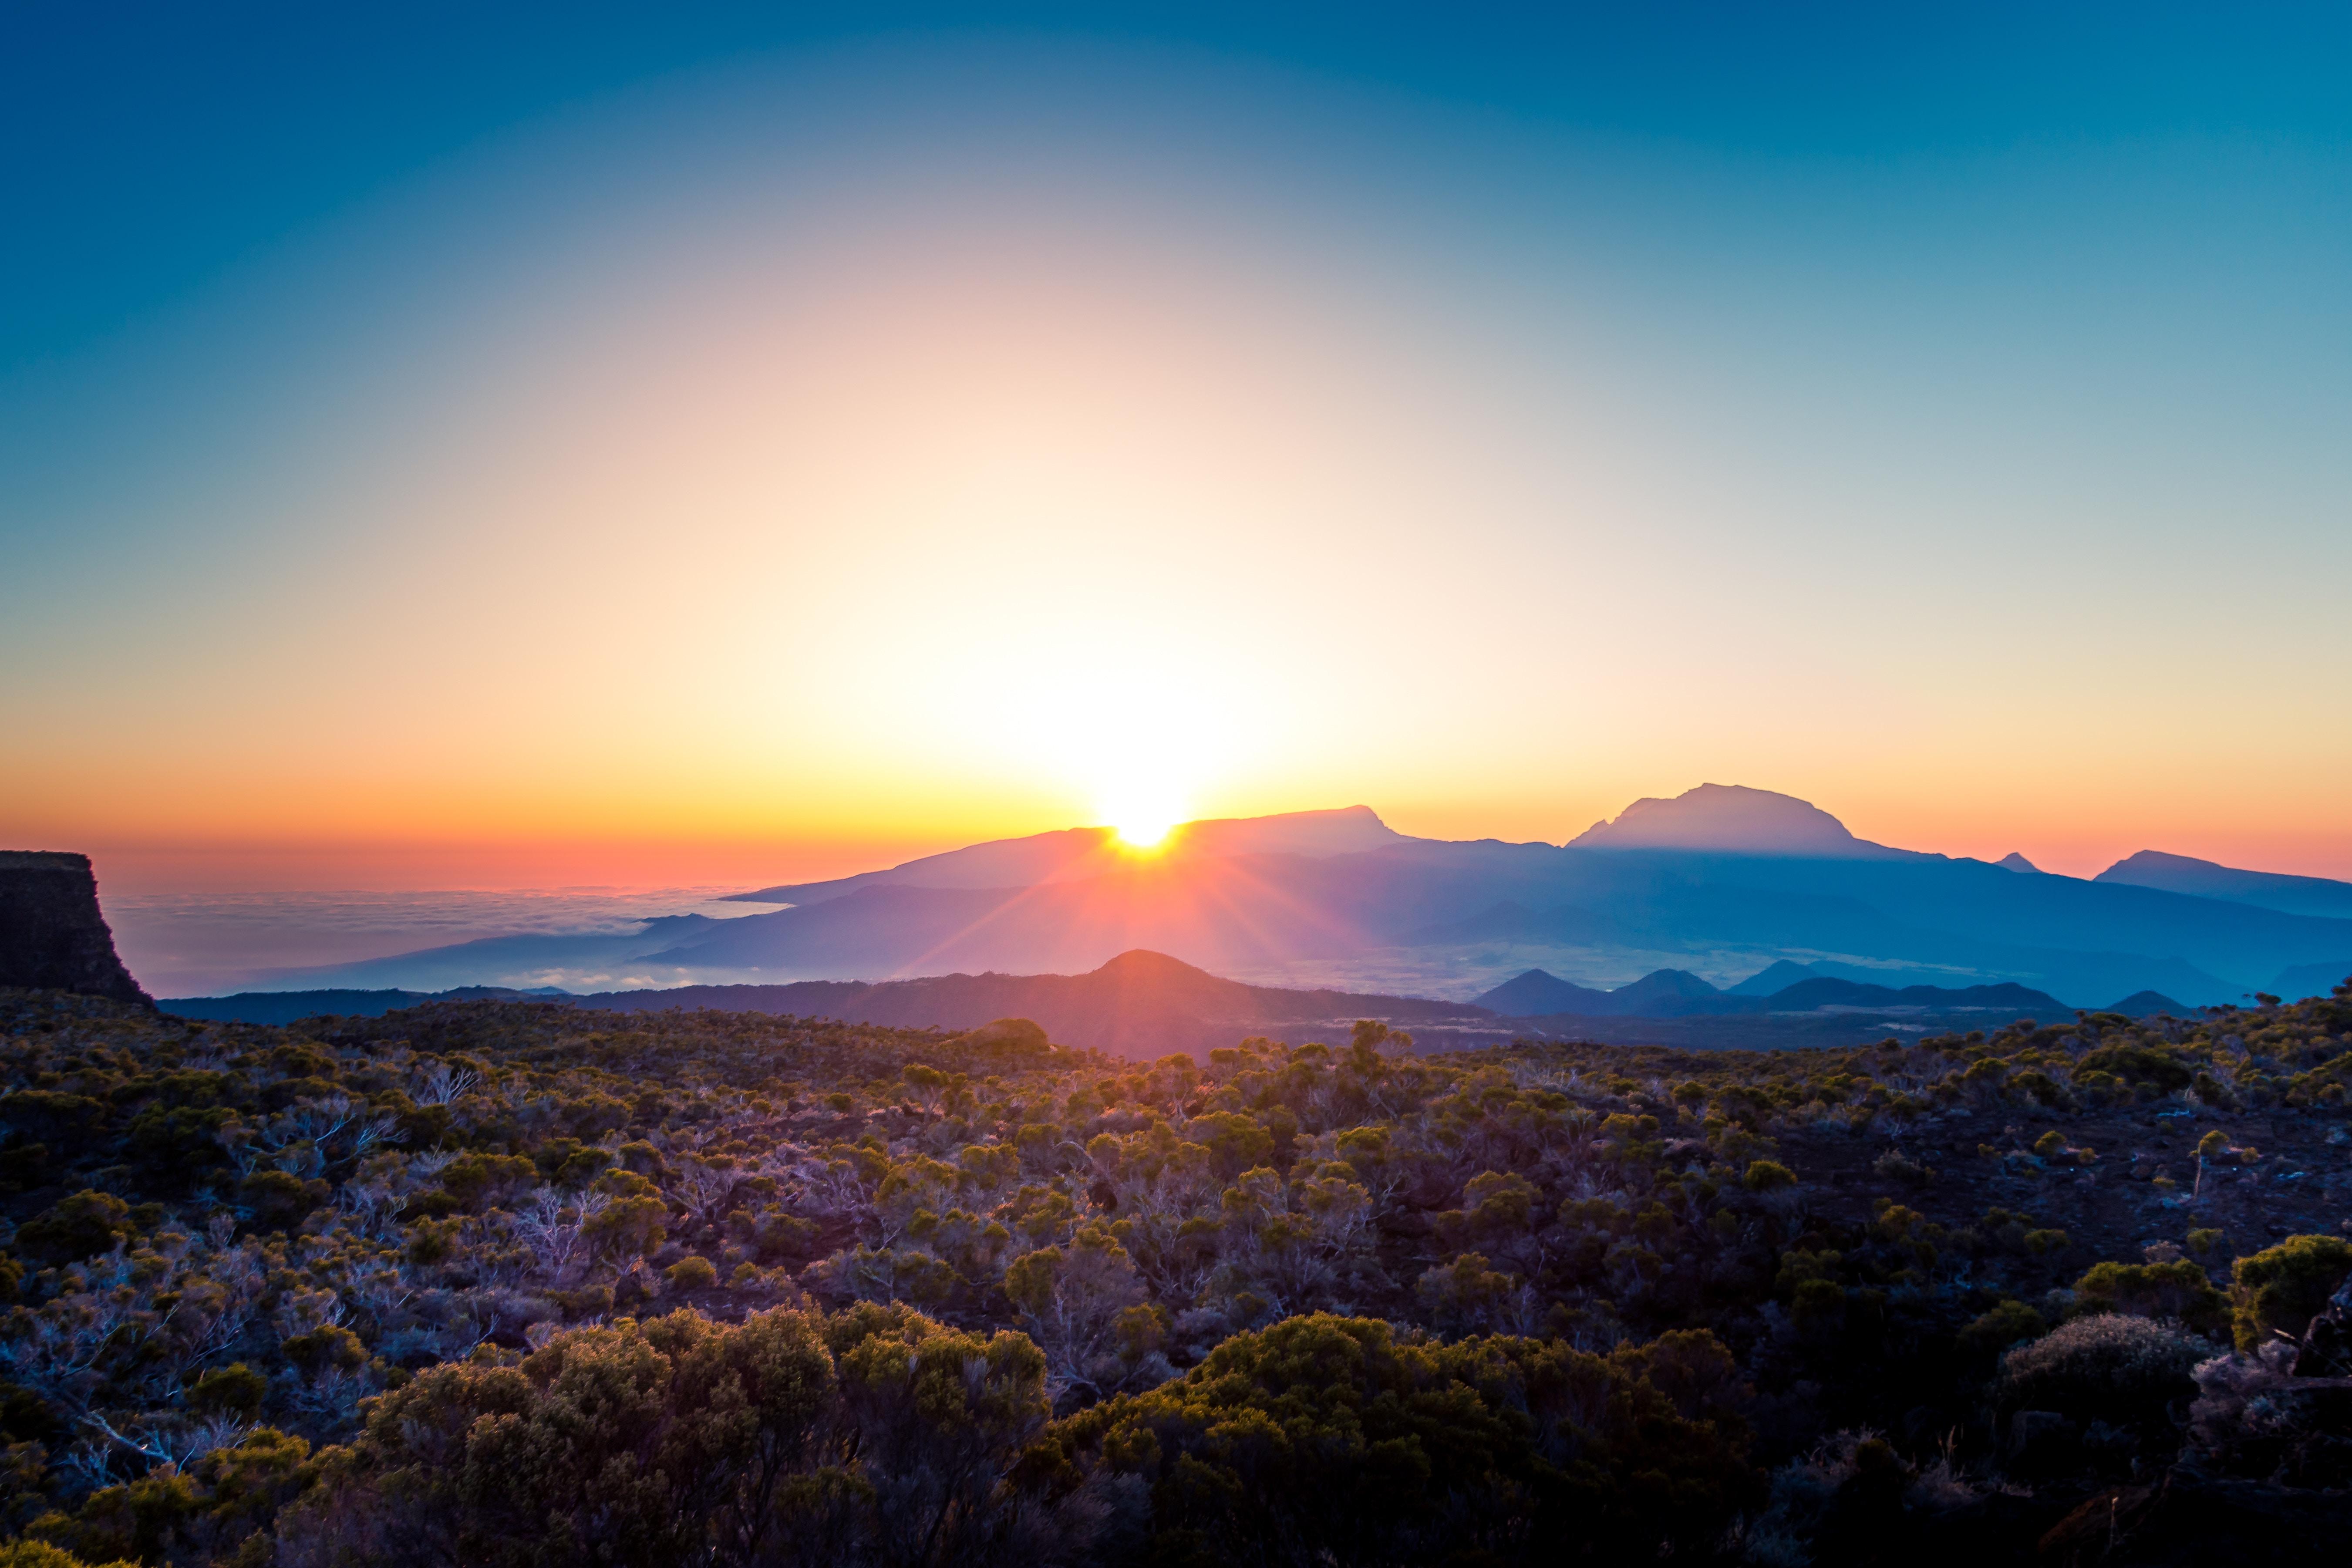 Beautiful morning sky landscape sunshine 5k hd nature 4k wallpapers images backgrounds - Background images 4k hd ...